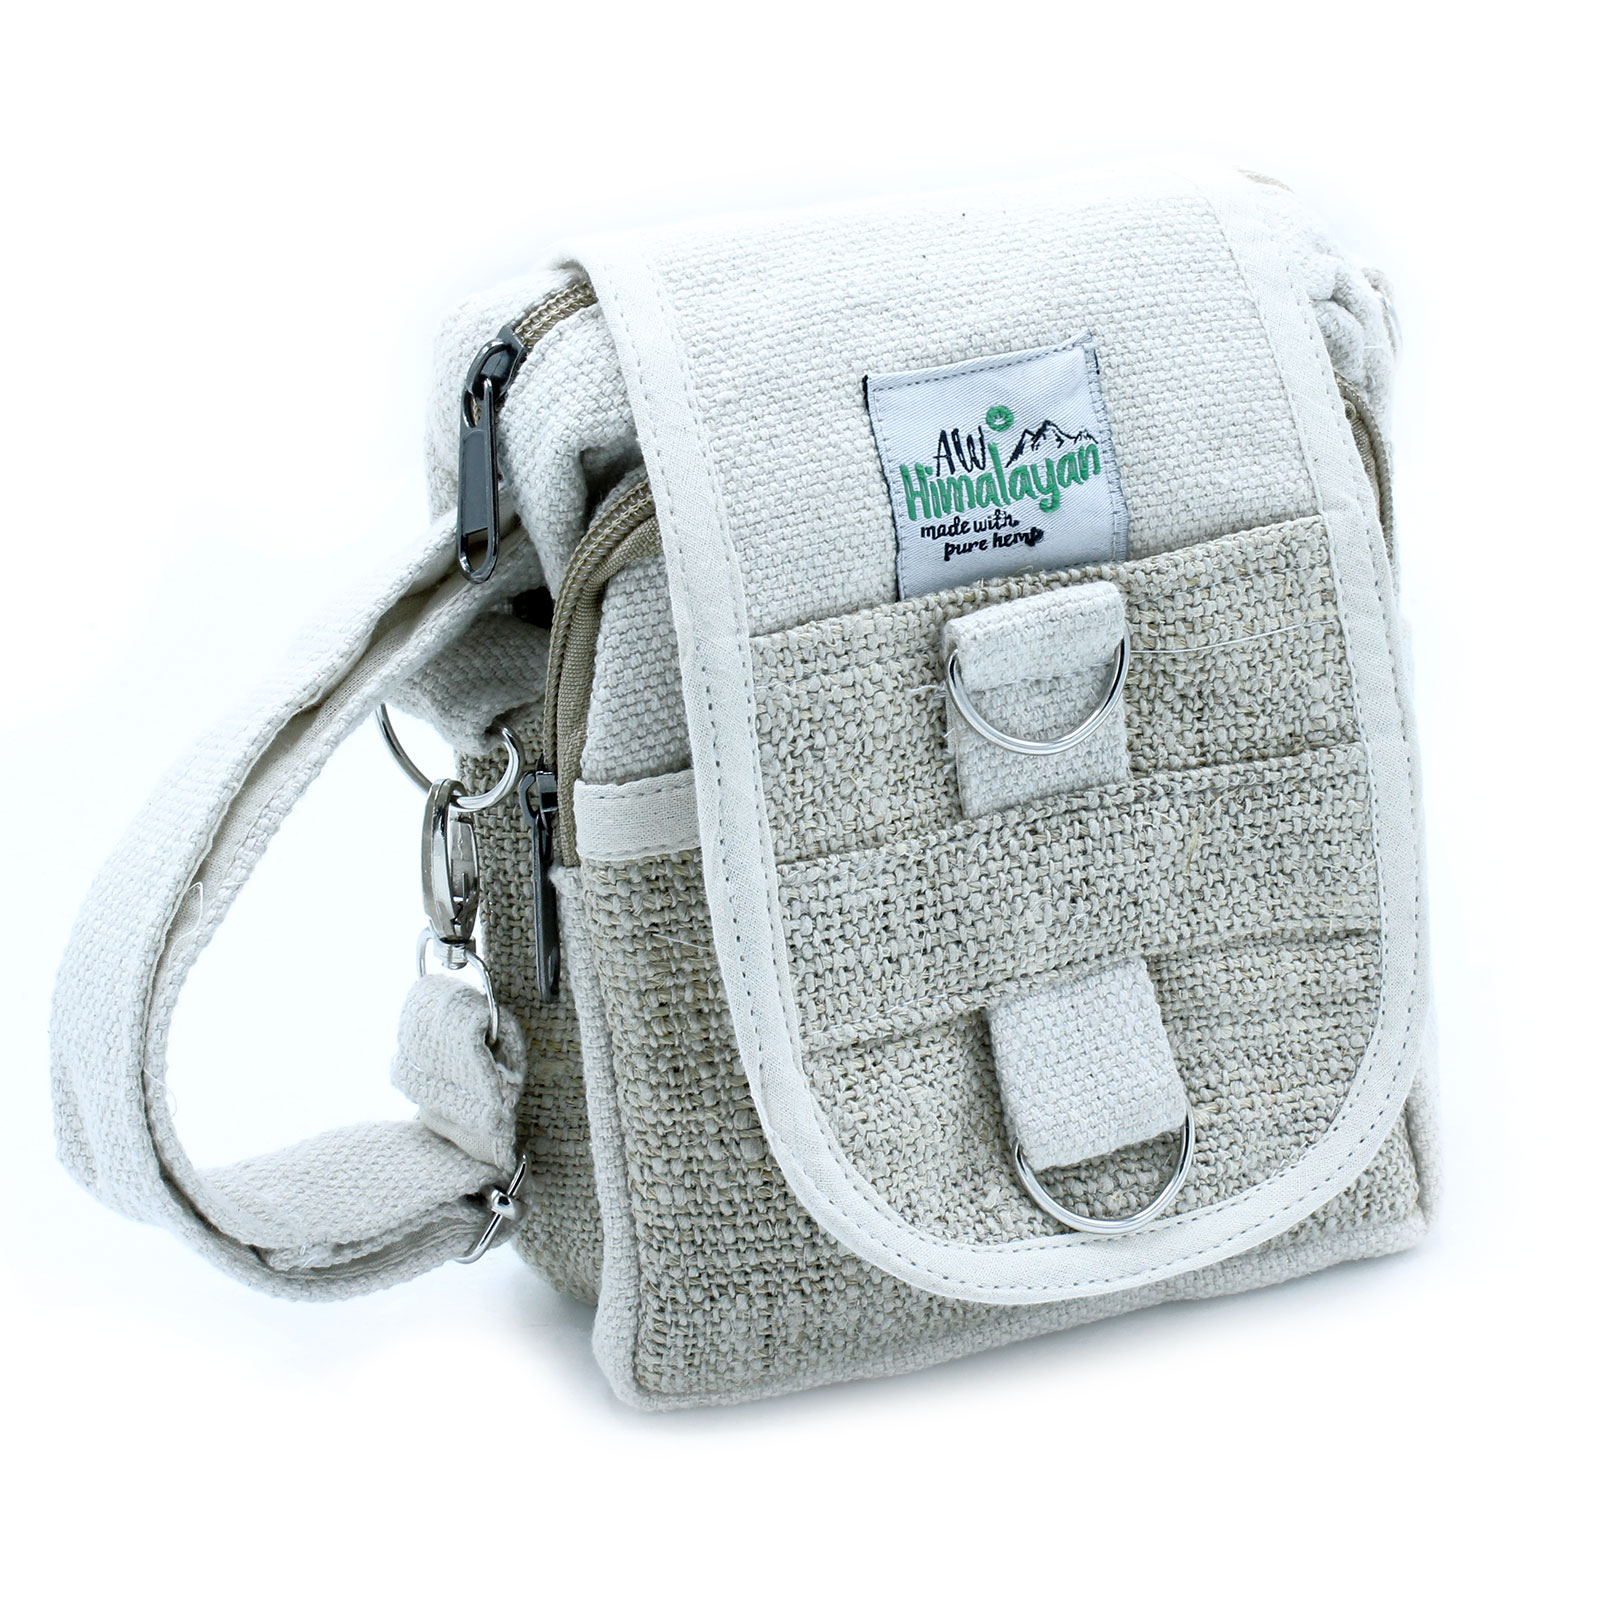 BodyCross Natural Hemp and Cotton Travel Bag